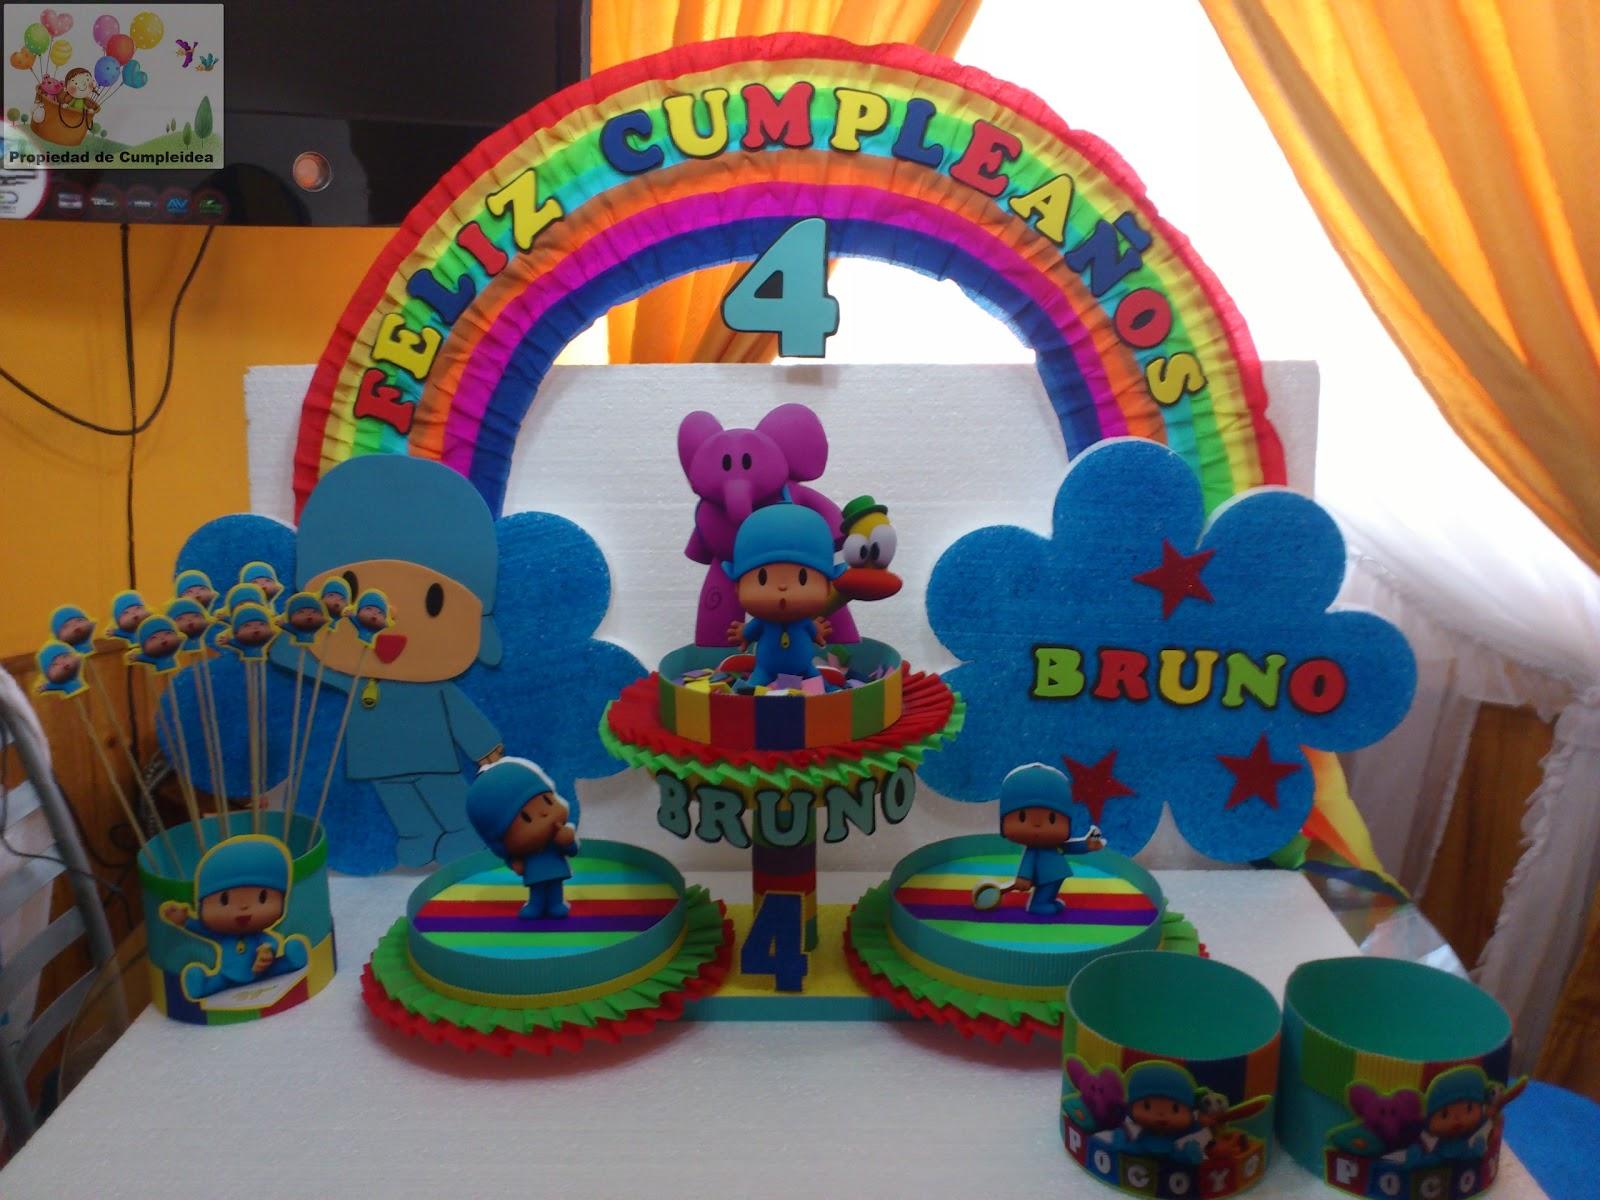 Imagenes De Decoracion Para Fiestas Infantiles - Decoracin-cumpleaos-infantiles